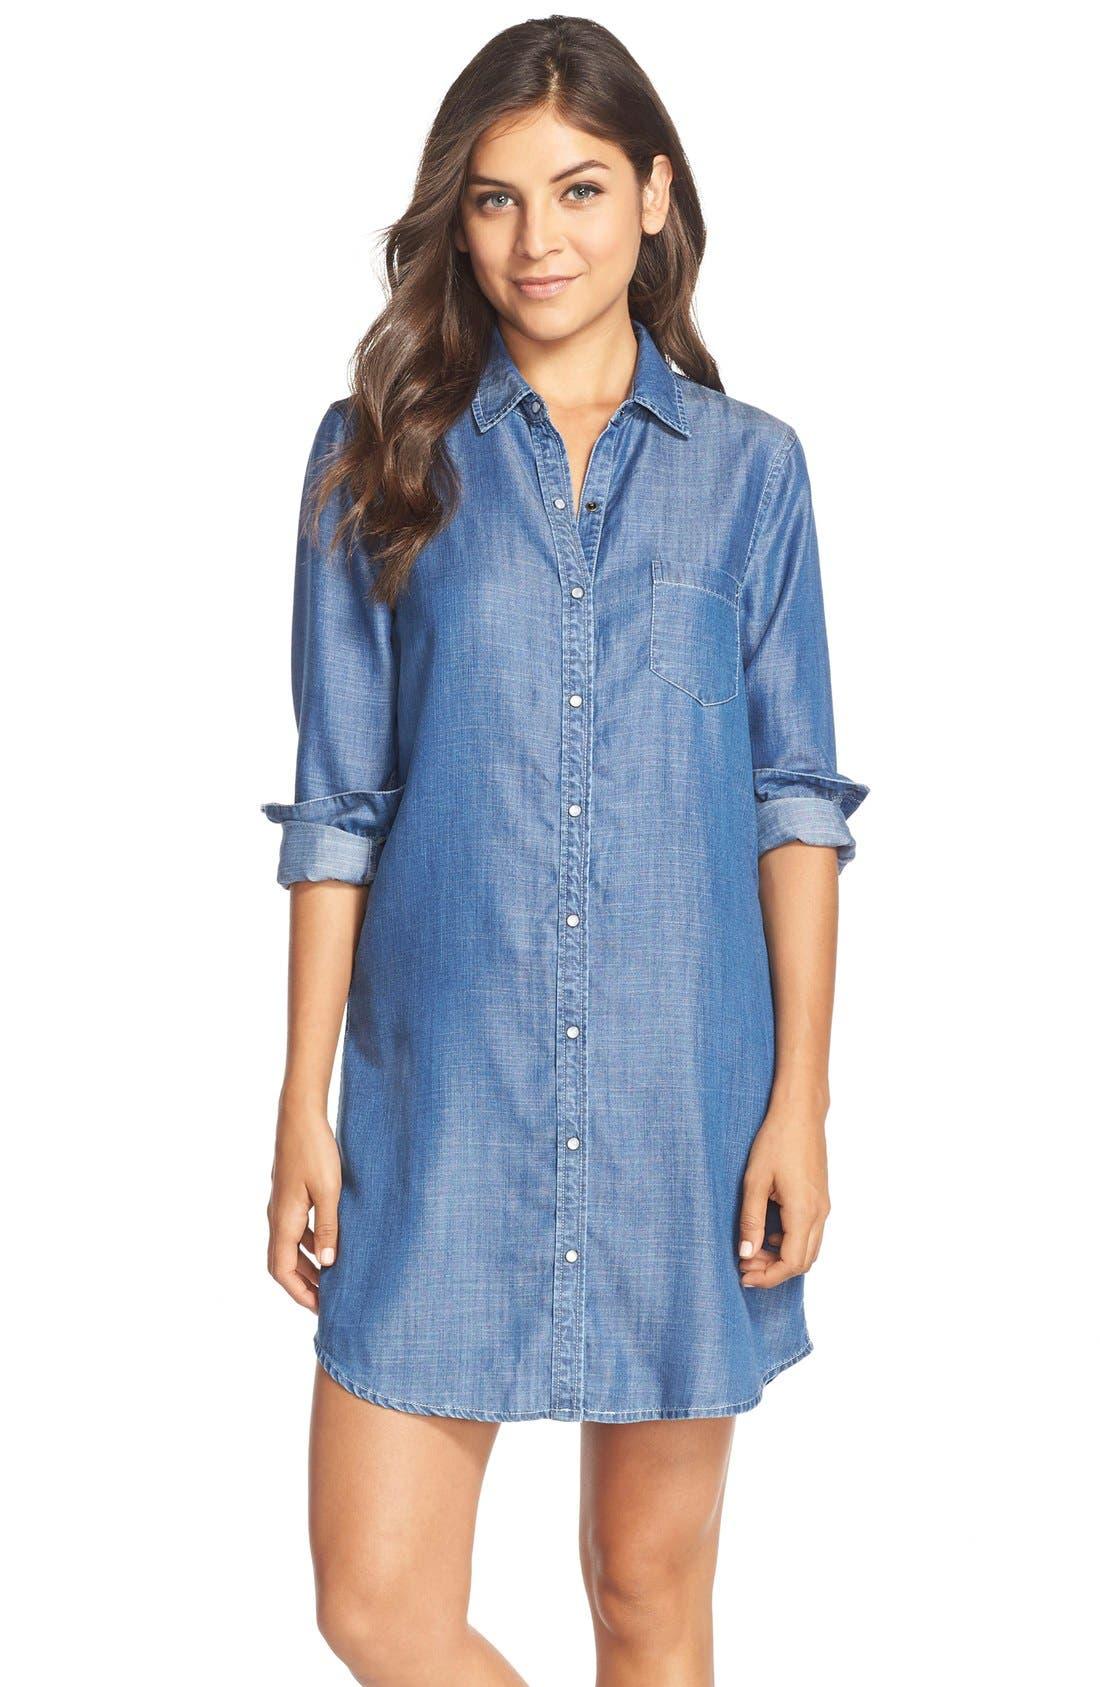 Alternate Image 1 Selected - Tart 'Jenine' Chambray Shirtdress